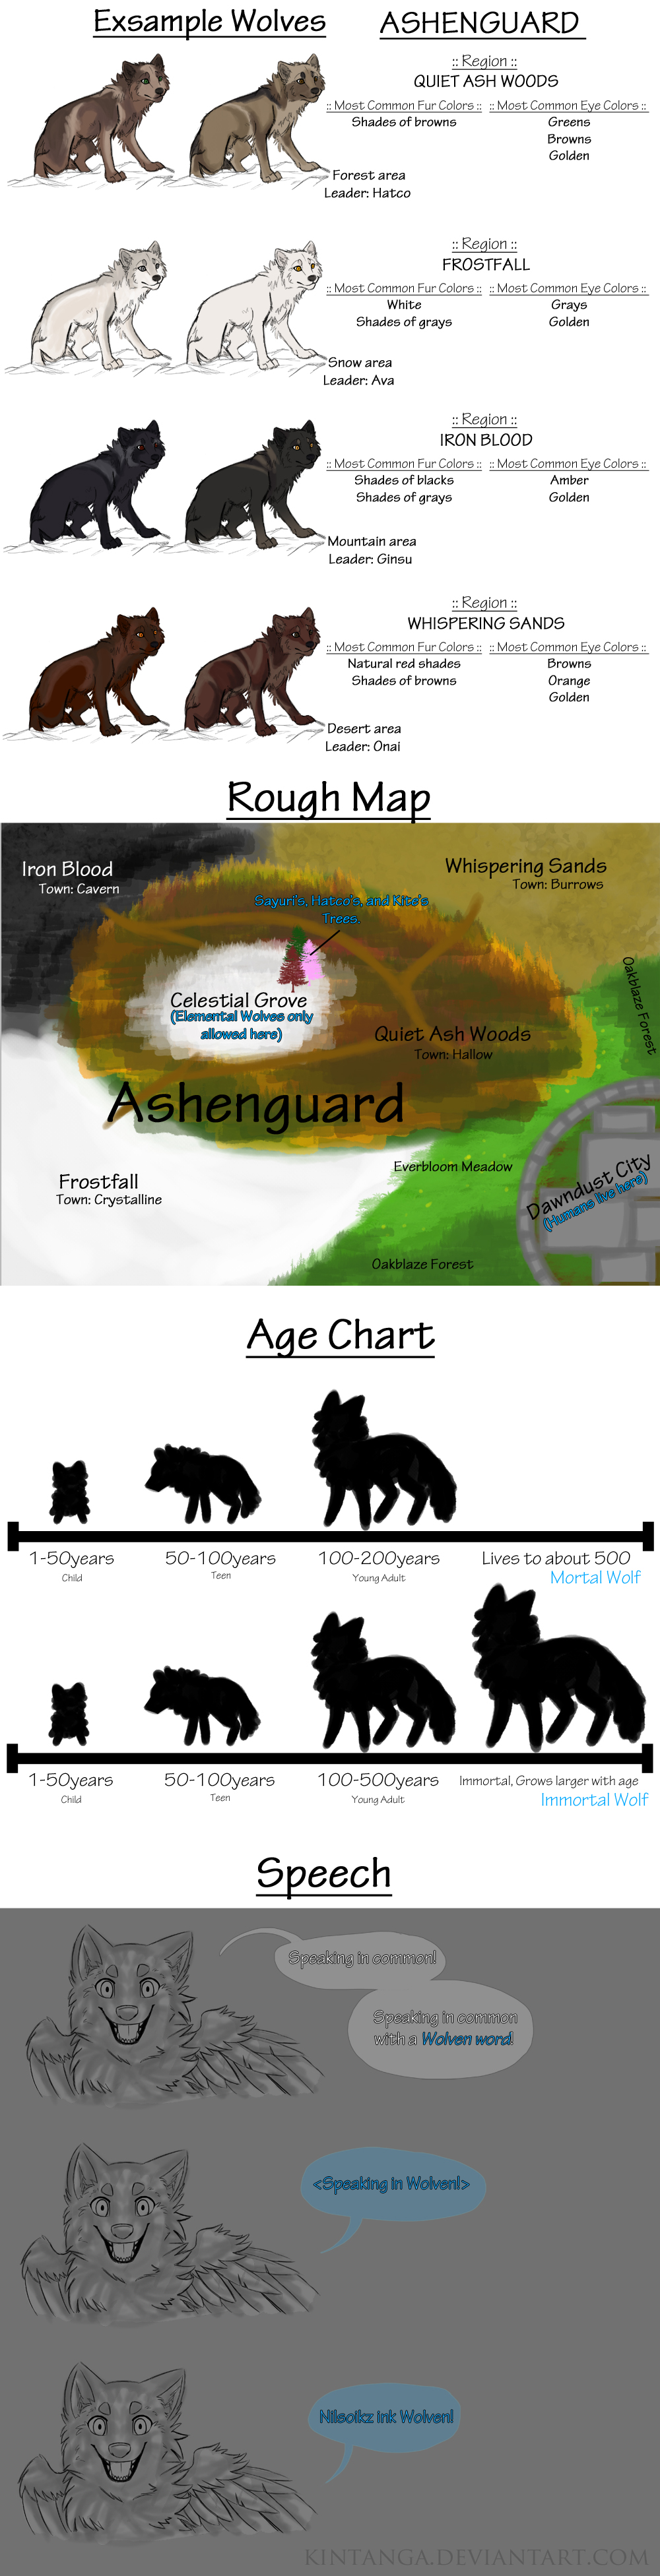 .TAW: Wolves-Map-Age Chart-Speech.+ by Kintanga